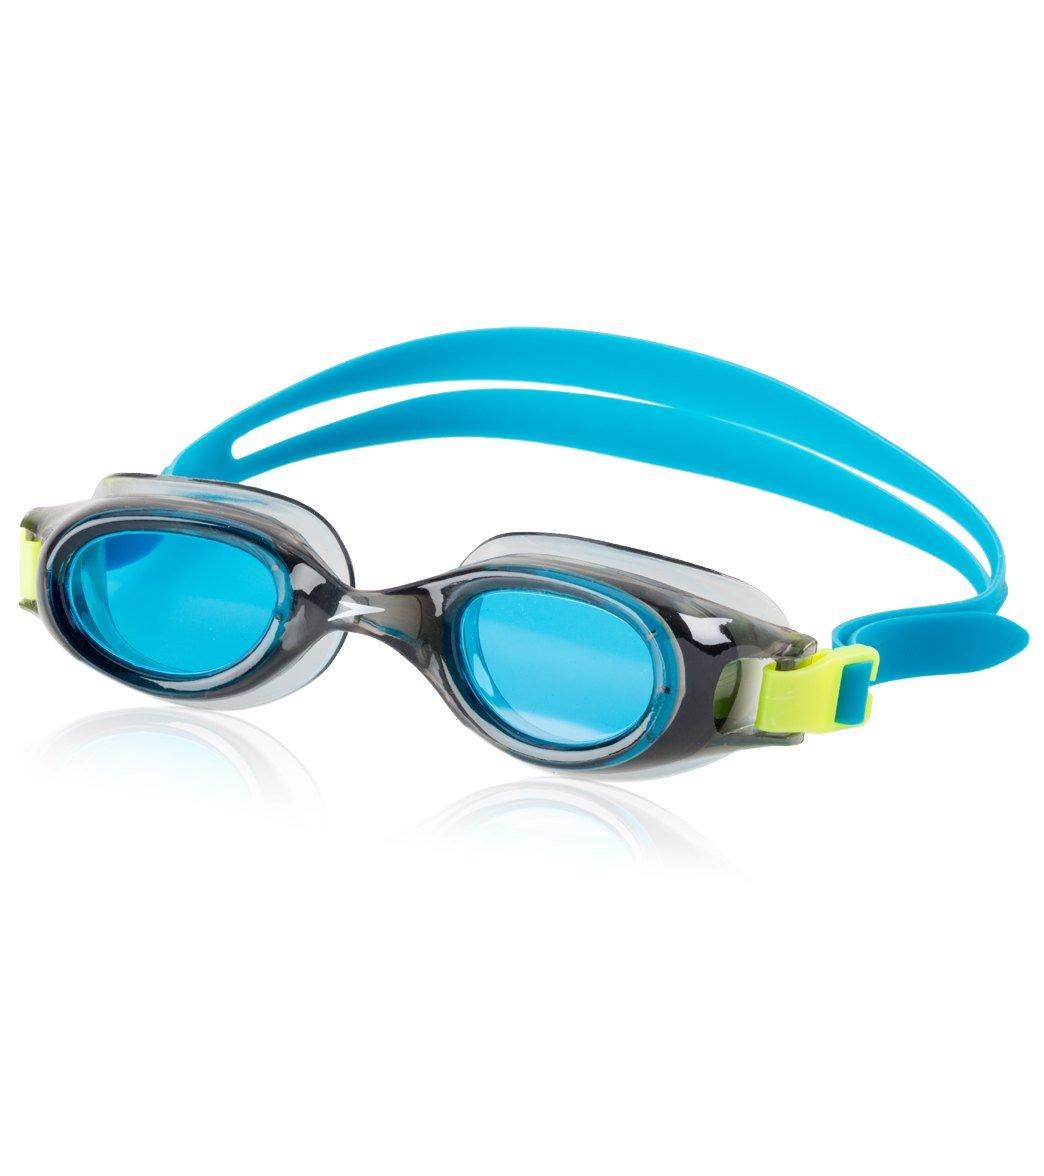 Speedo Jr. Hydrospex Goggle